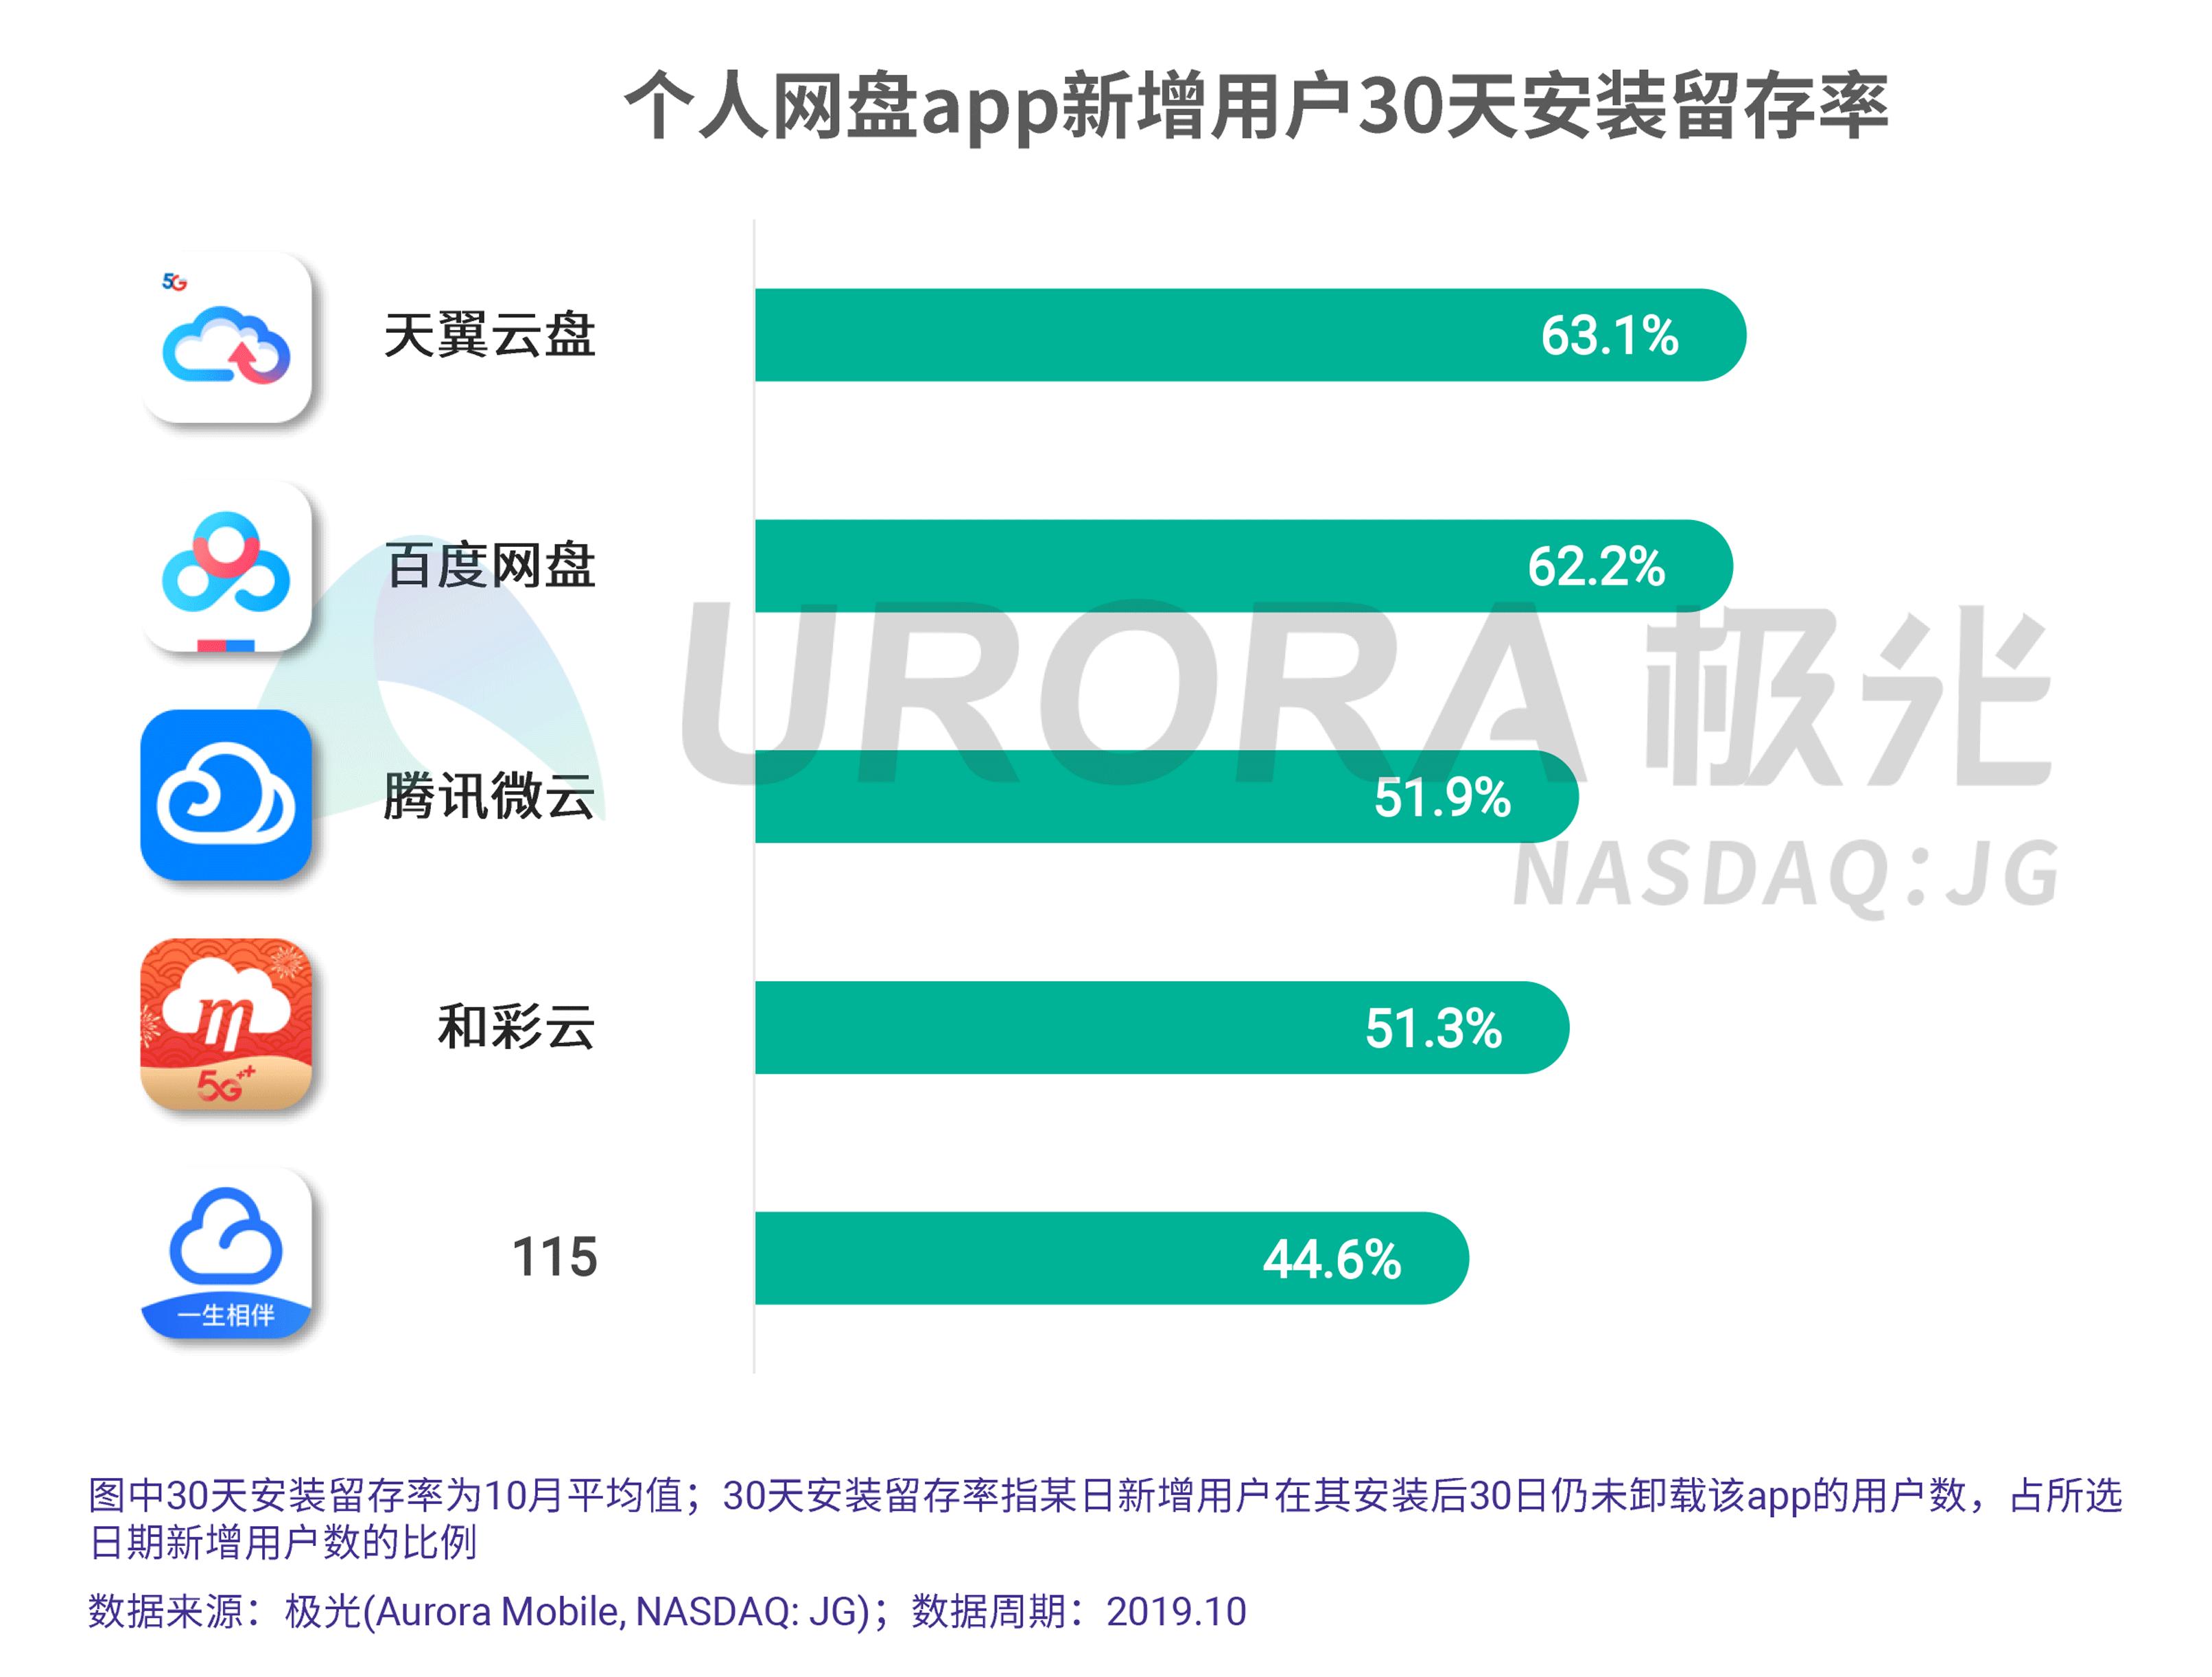 JIGUANG-个人网盘行业研究报告-final---切图版2-16.png